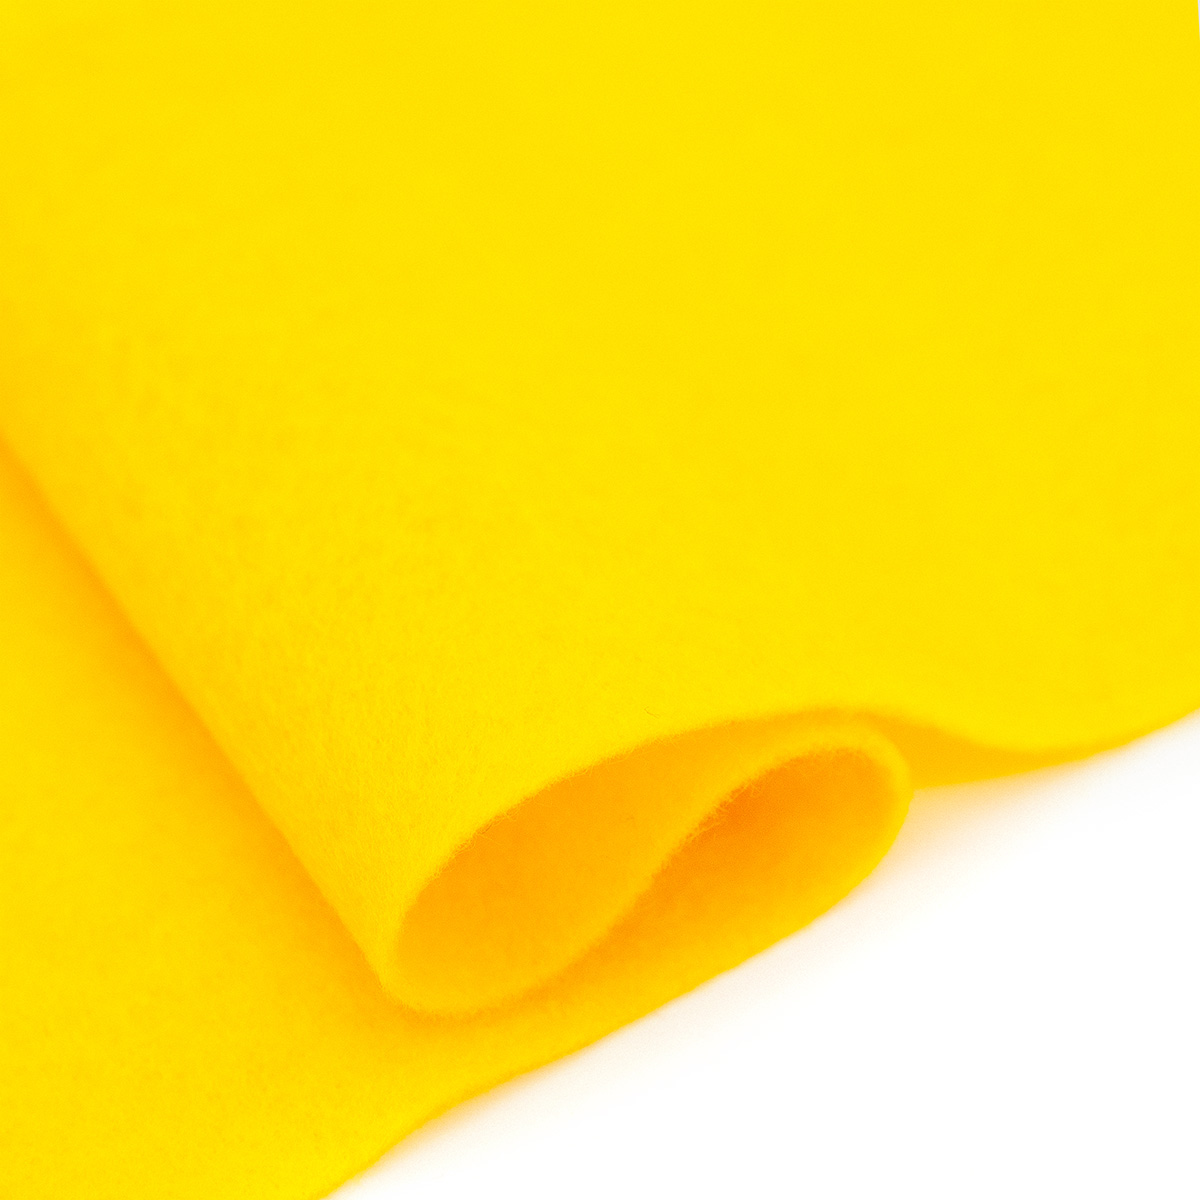 61212660 Фетр для творчества, желтый, 2мм, 20x30см, уп./1шт. Glorex